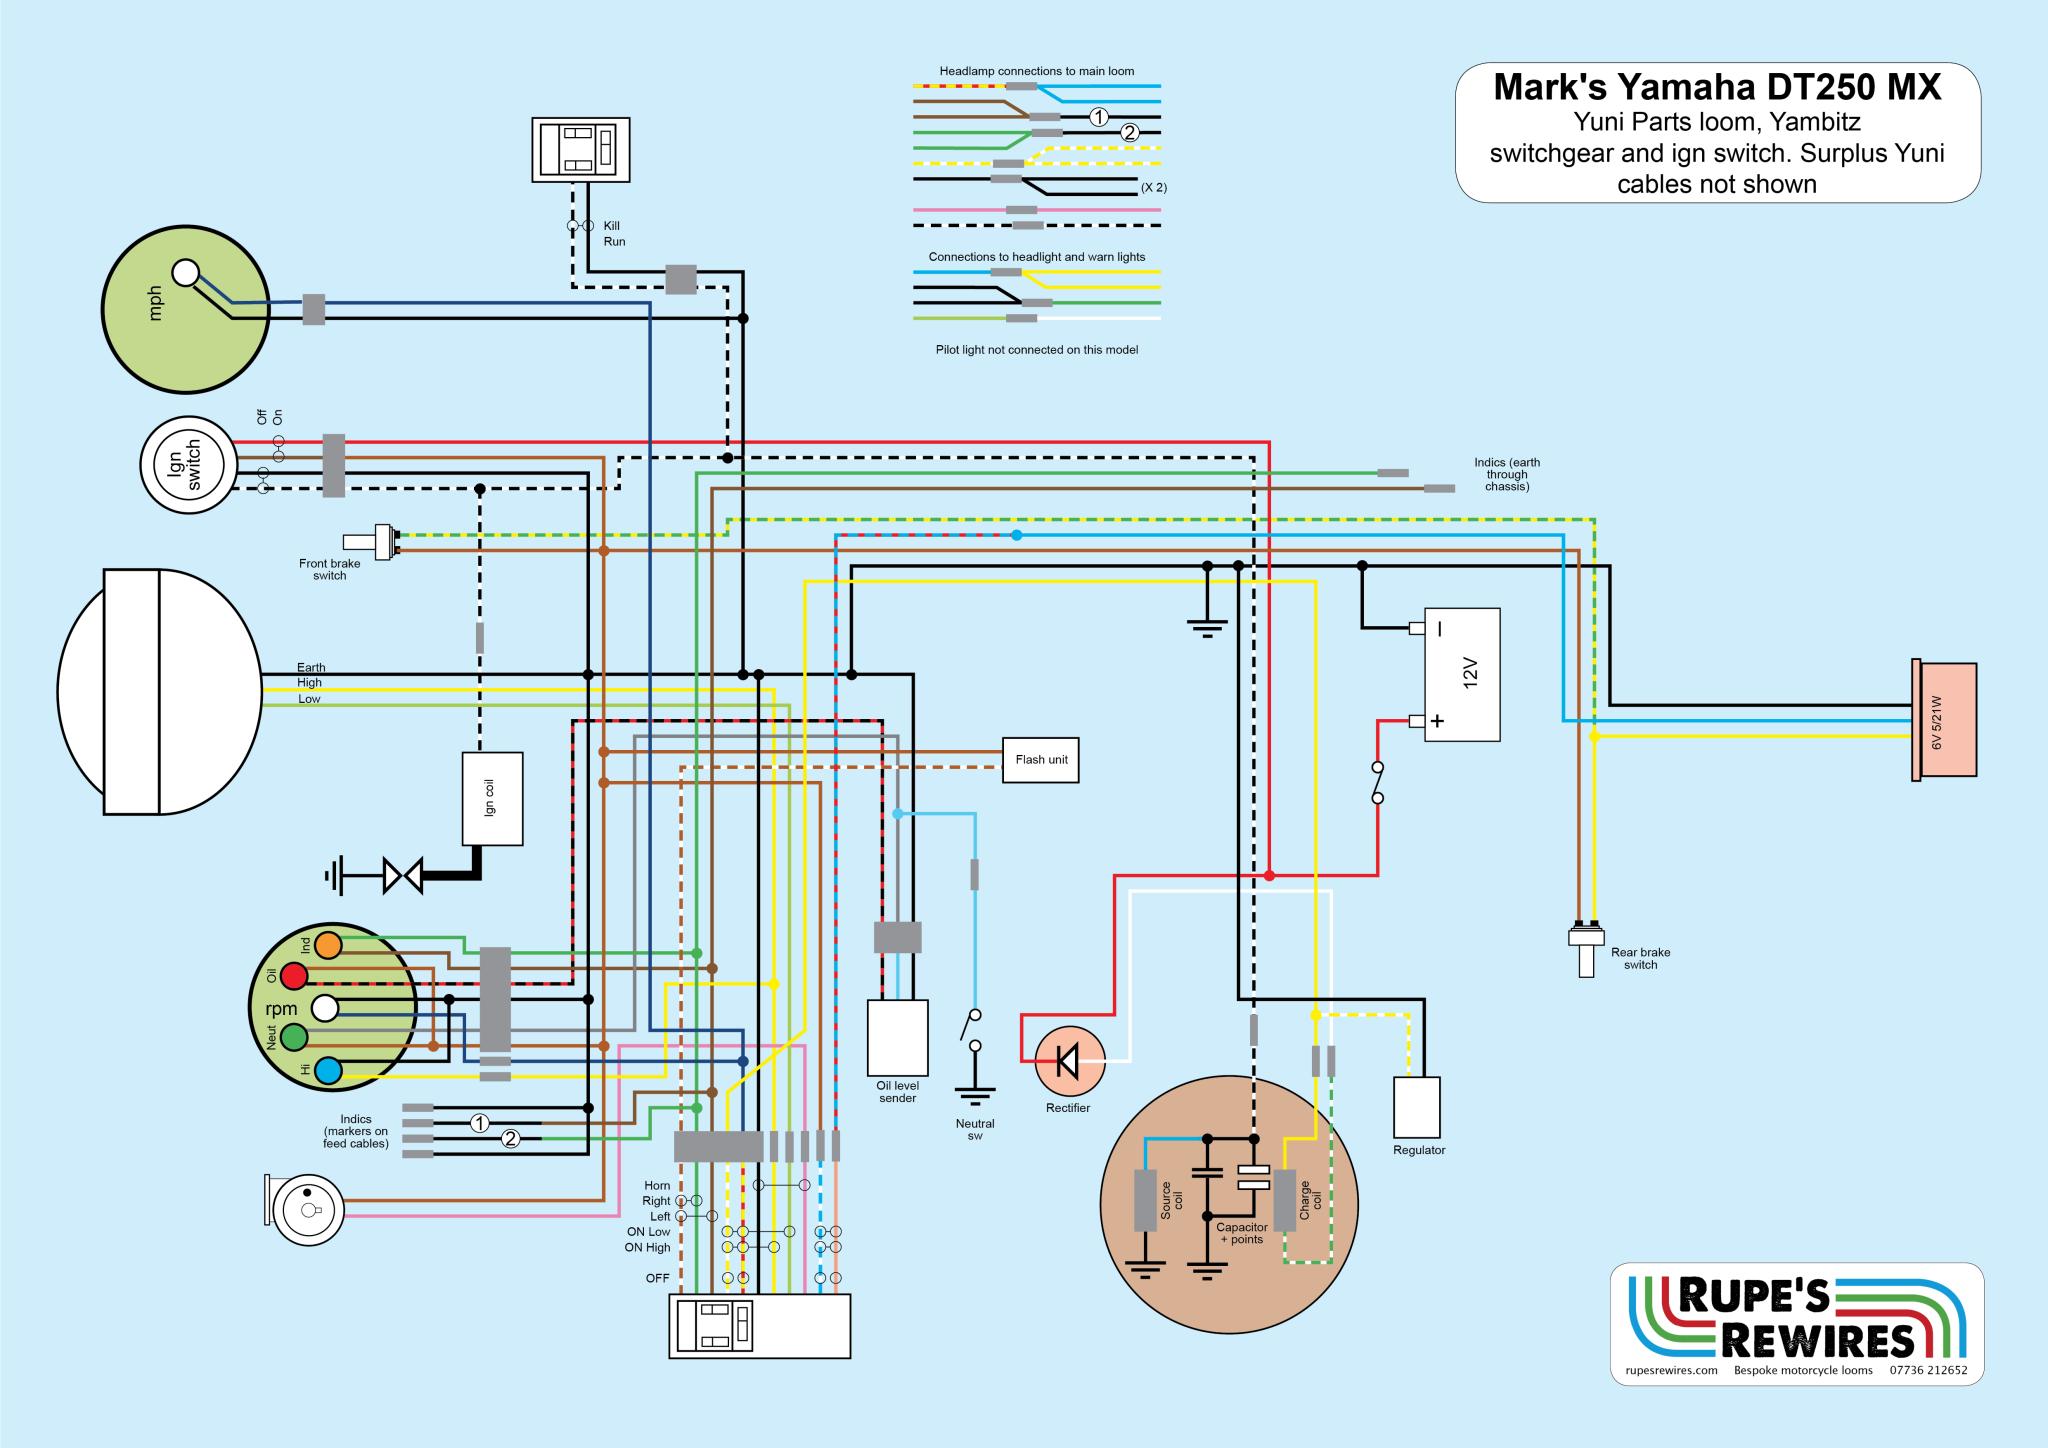 Wiring Diagram Yamaha Dt 250 - Page 3 - Wiring Diagram And Schematics